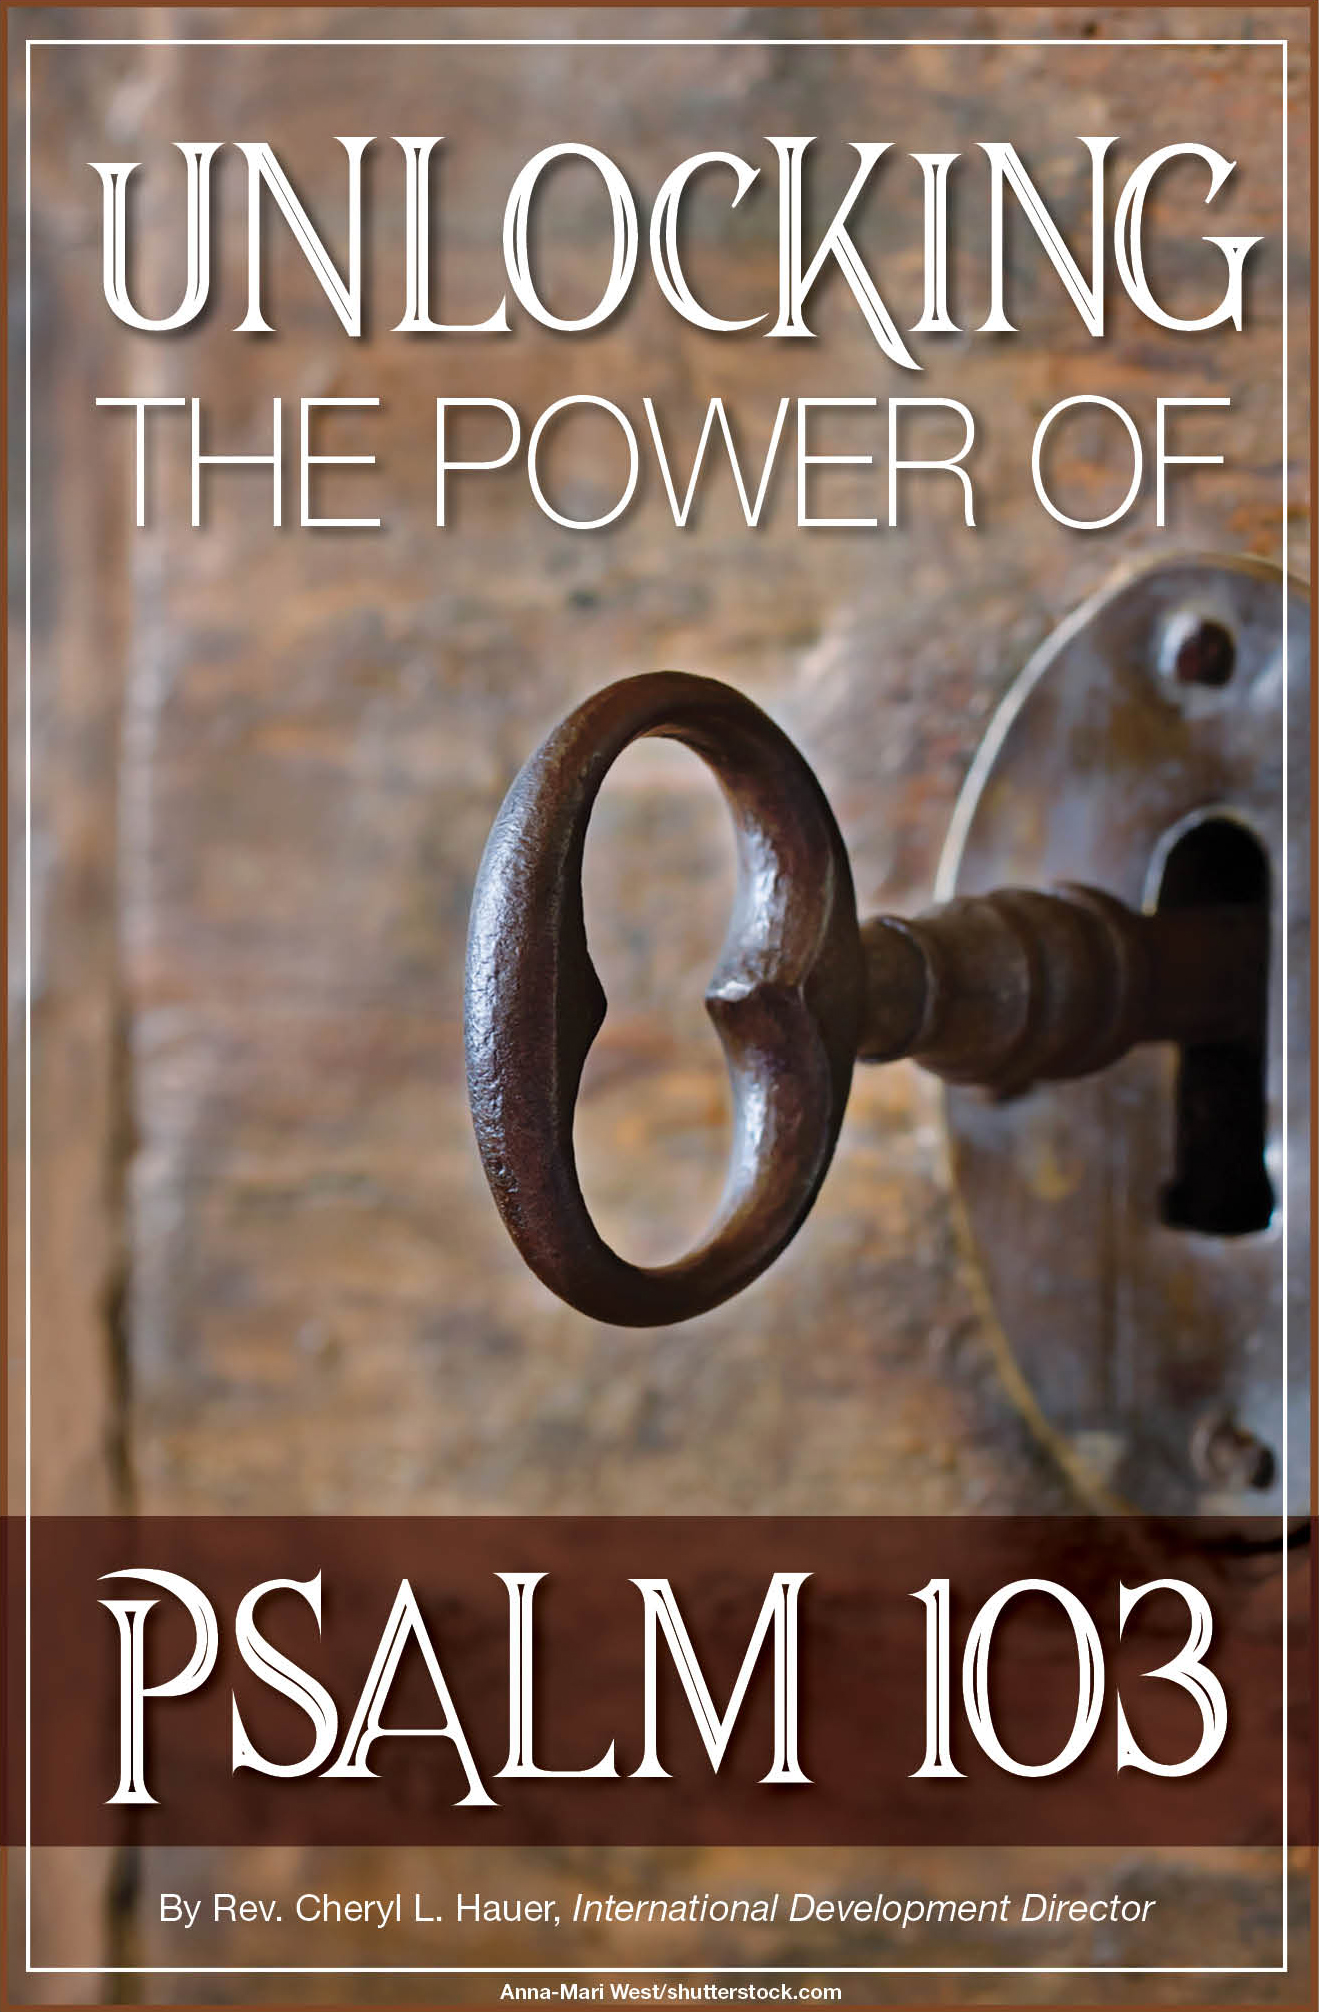 Unlocking the Power of Psalm 103 - Bridges for PeaceBridges